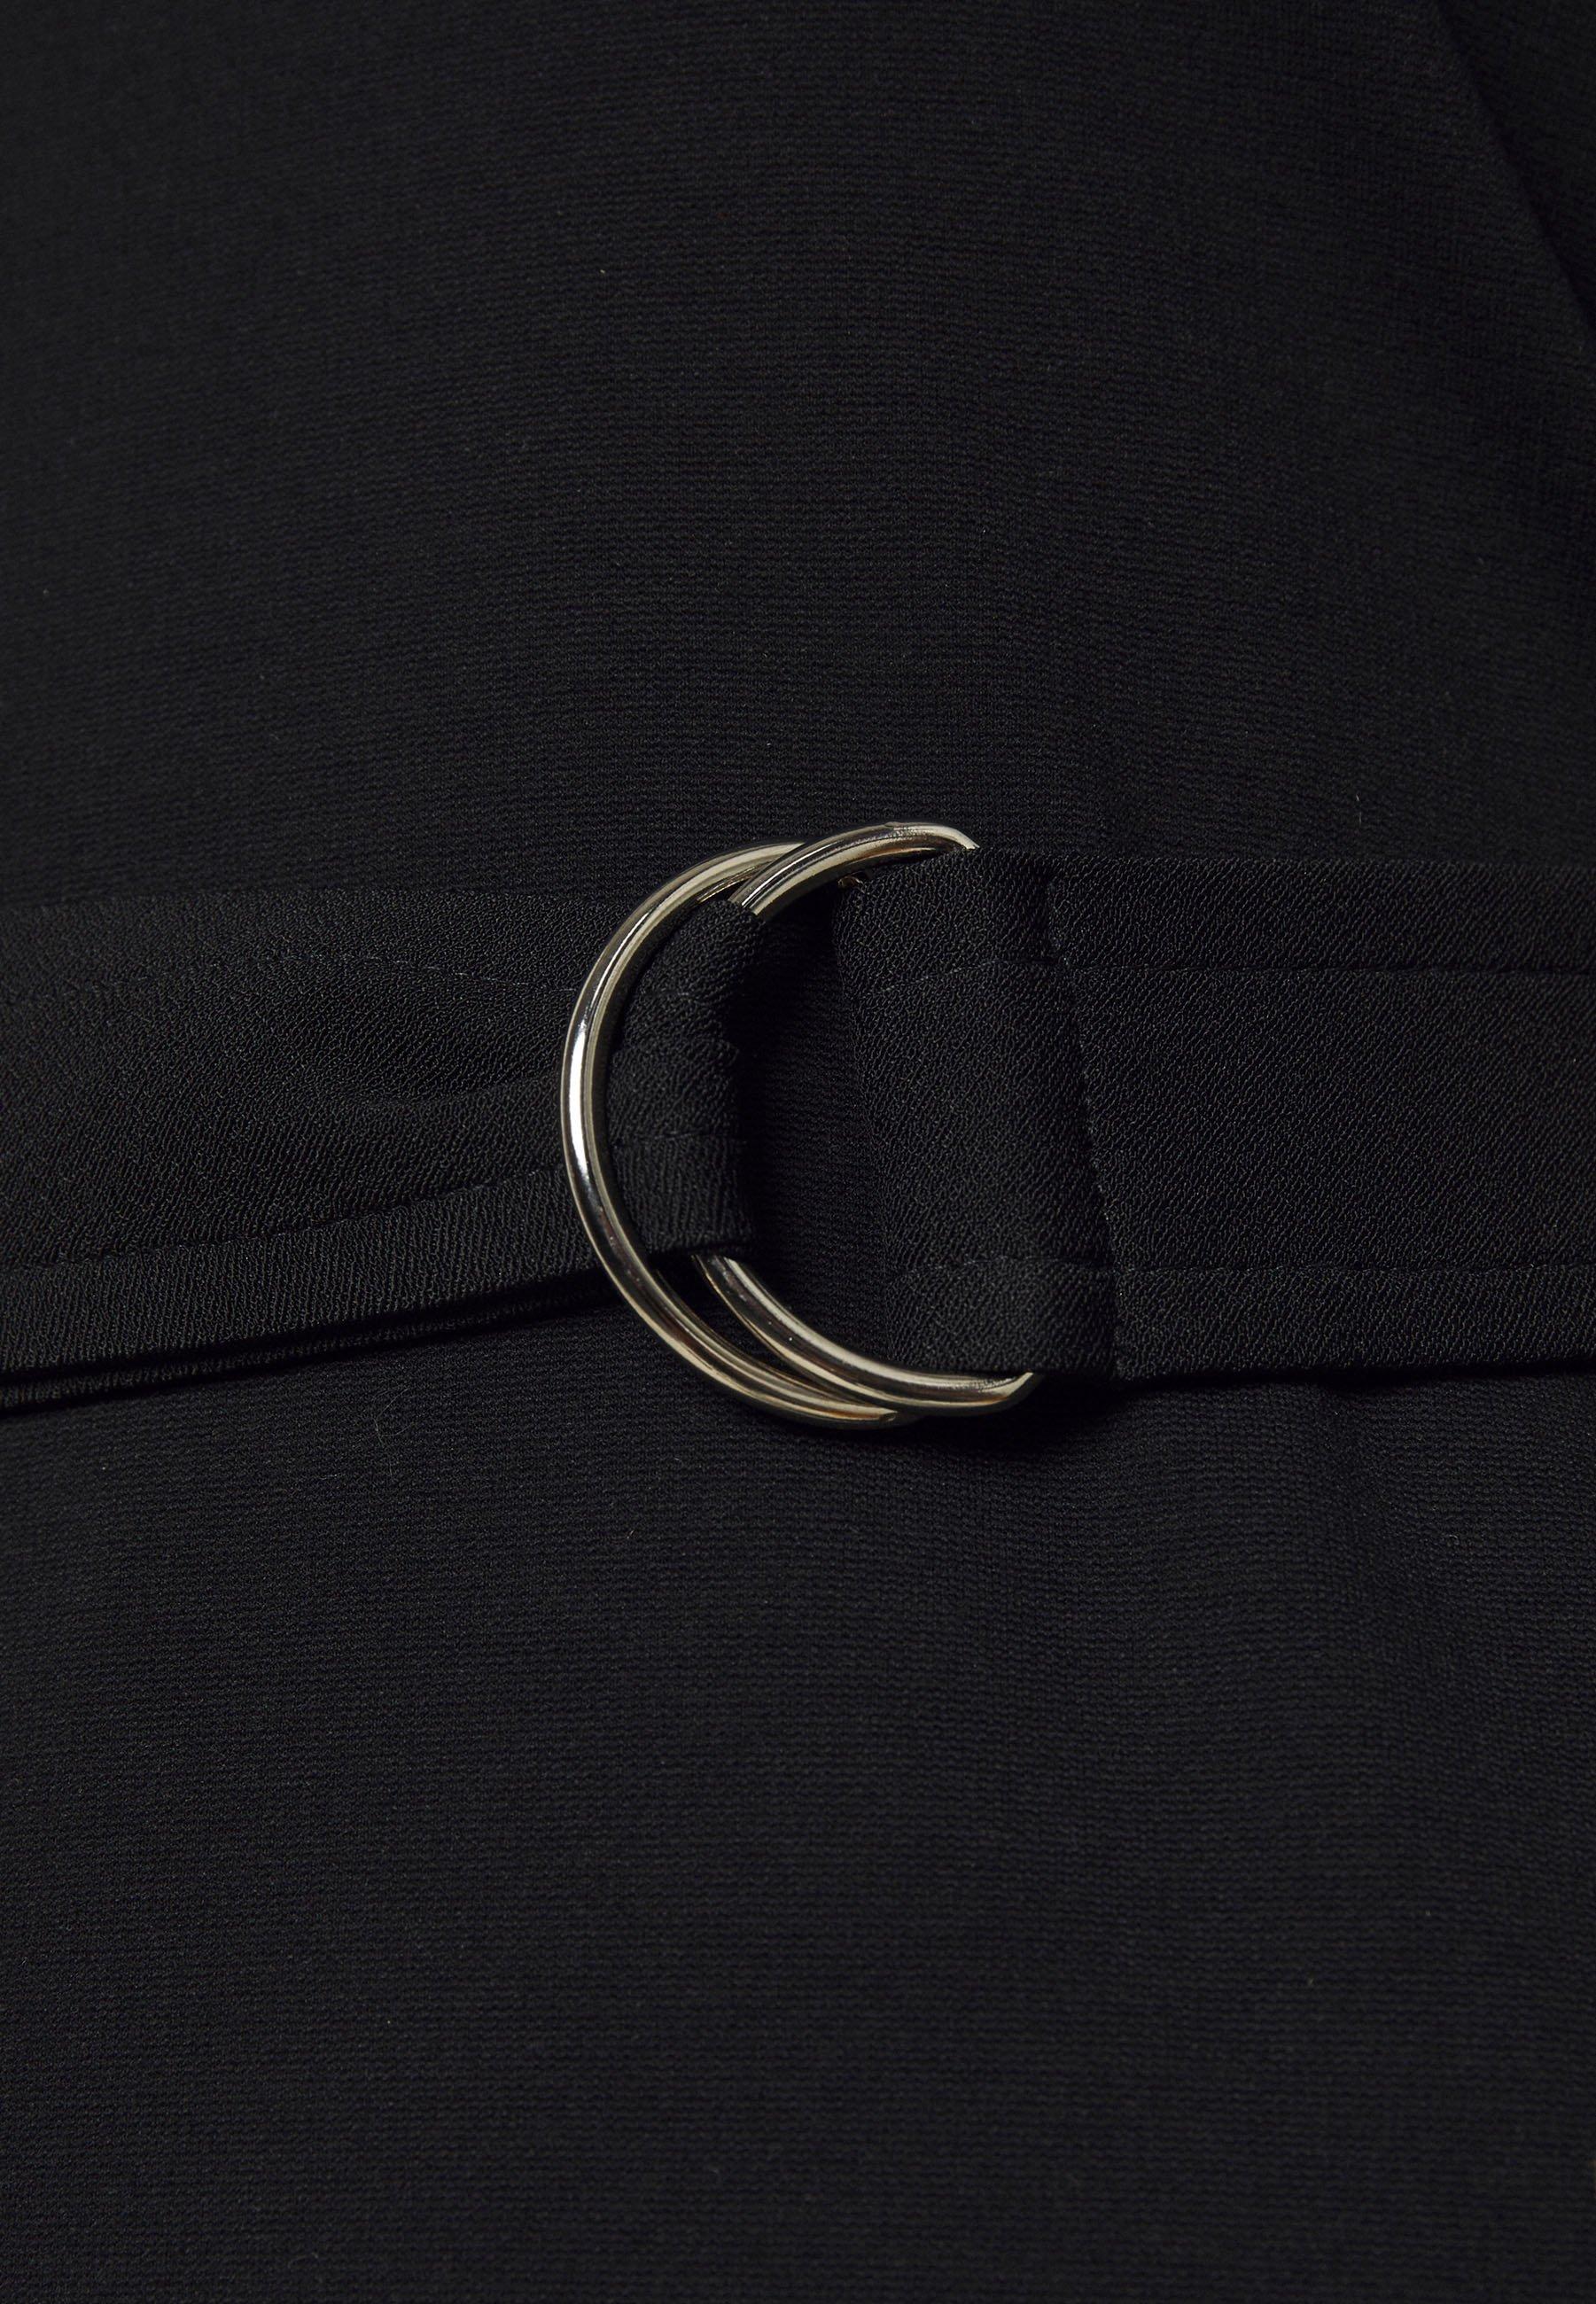 Order Women's Clothing Marimekko KALEET DRESS Jersey dress black SzflEFBzW